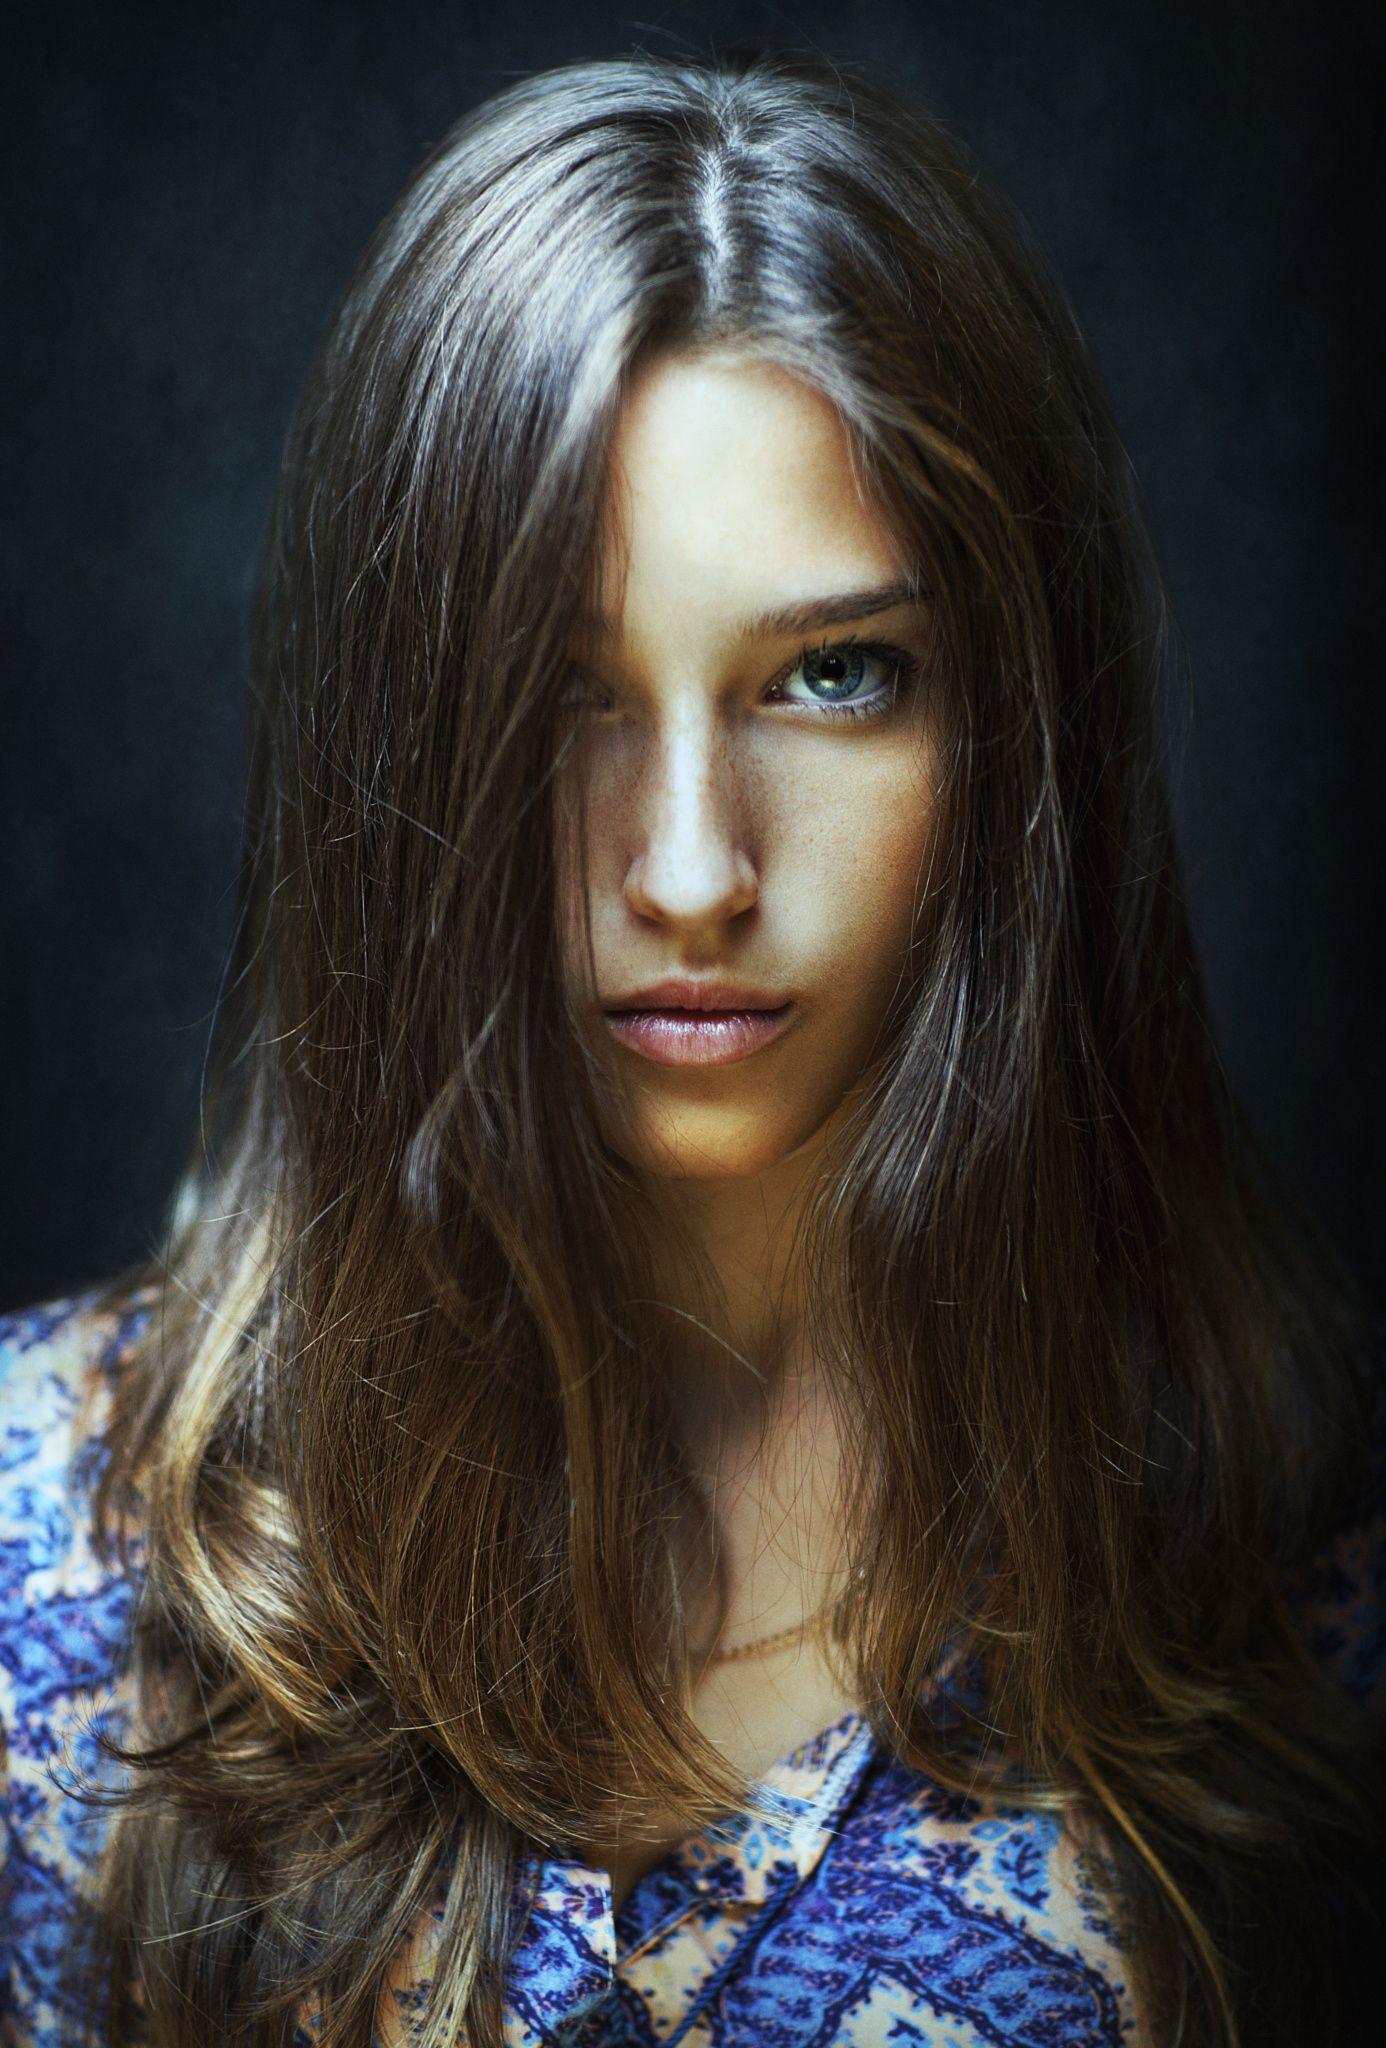 Tanya By Zachar Rise On 500px Most Beautiful Eyes Dark